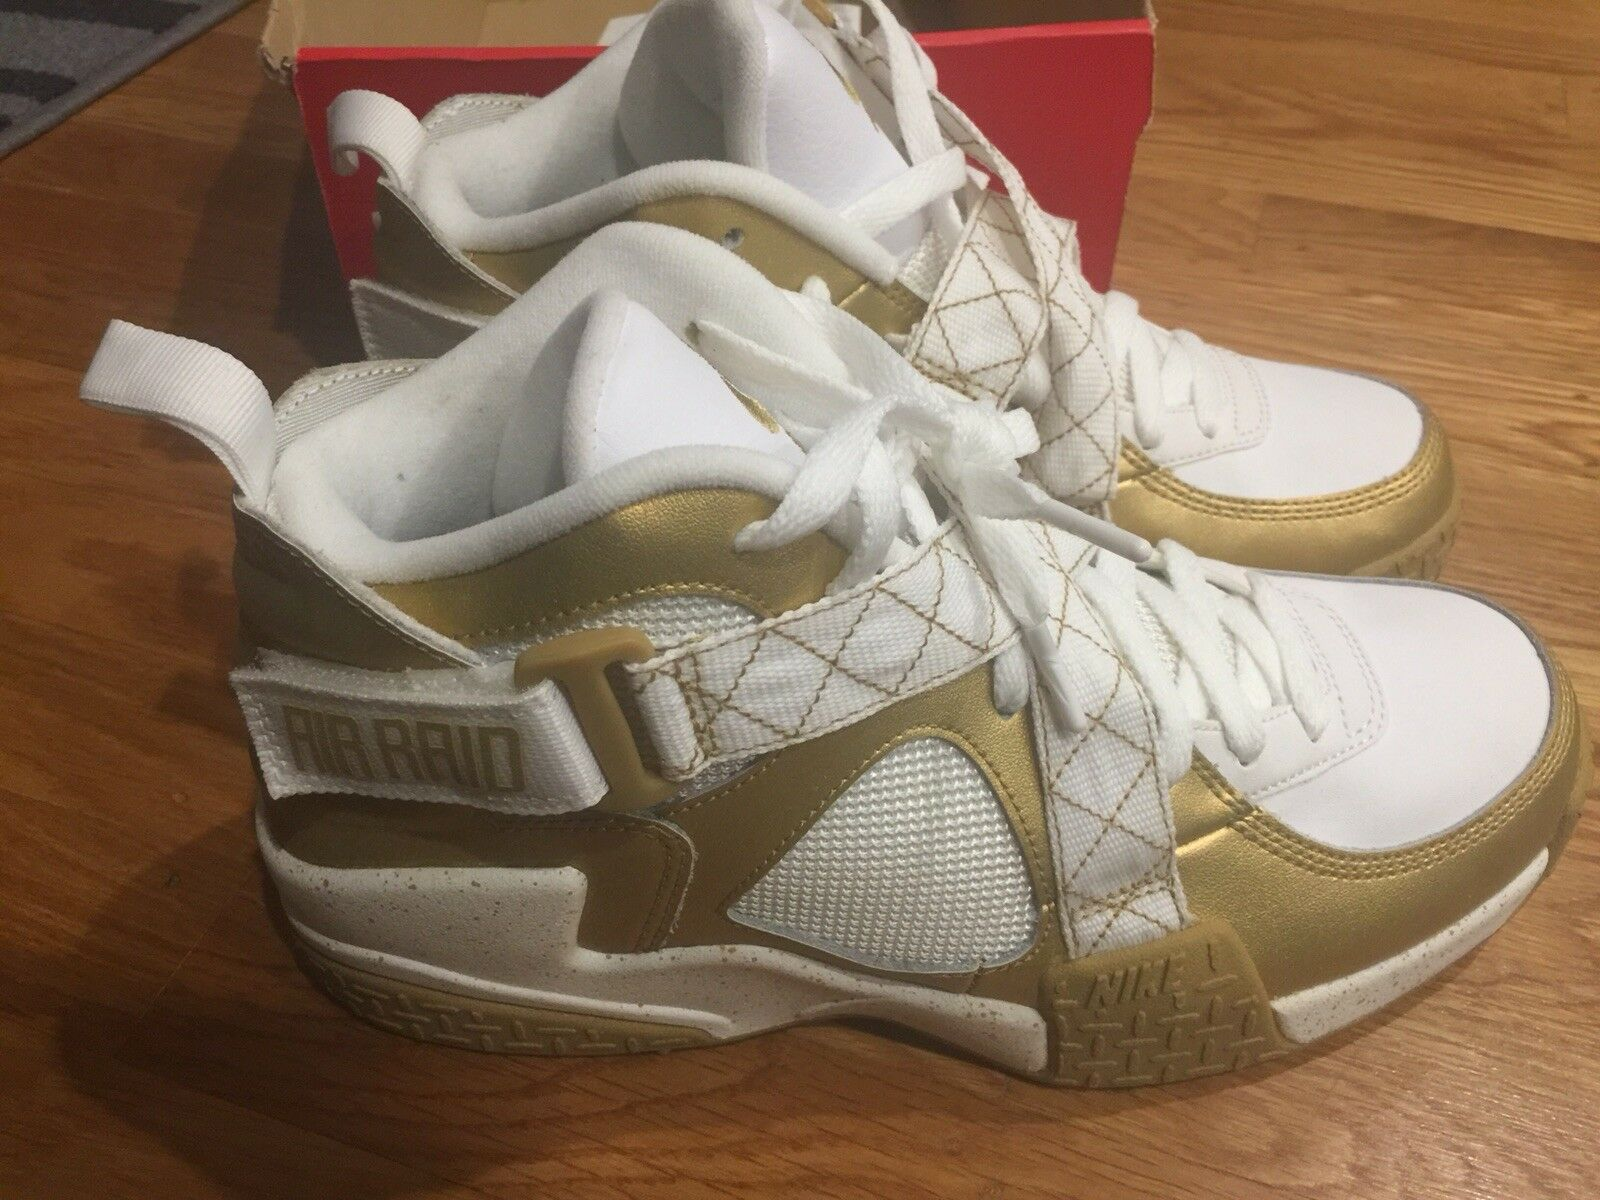 1f015737 Metallic Raid Nike gold Air 9 Size Men's, white 4921cgppx13067 ...